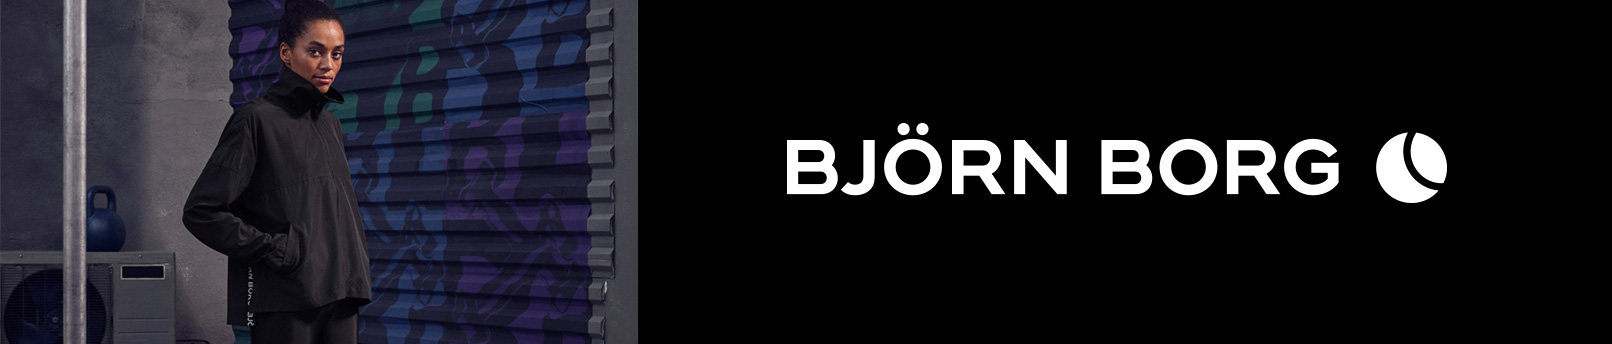 Shop Björn Borg